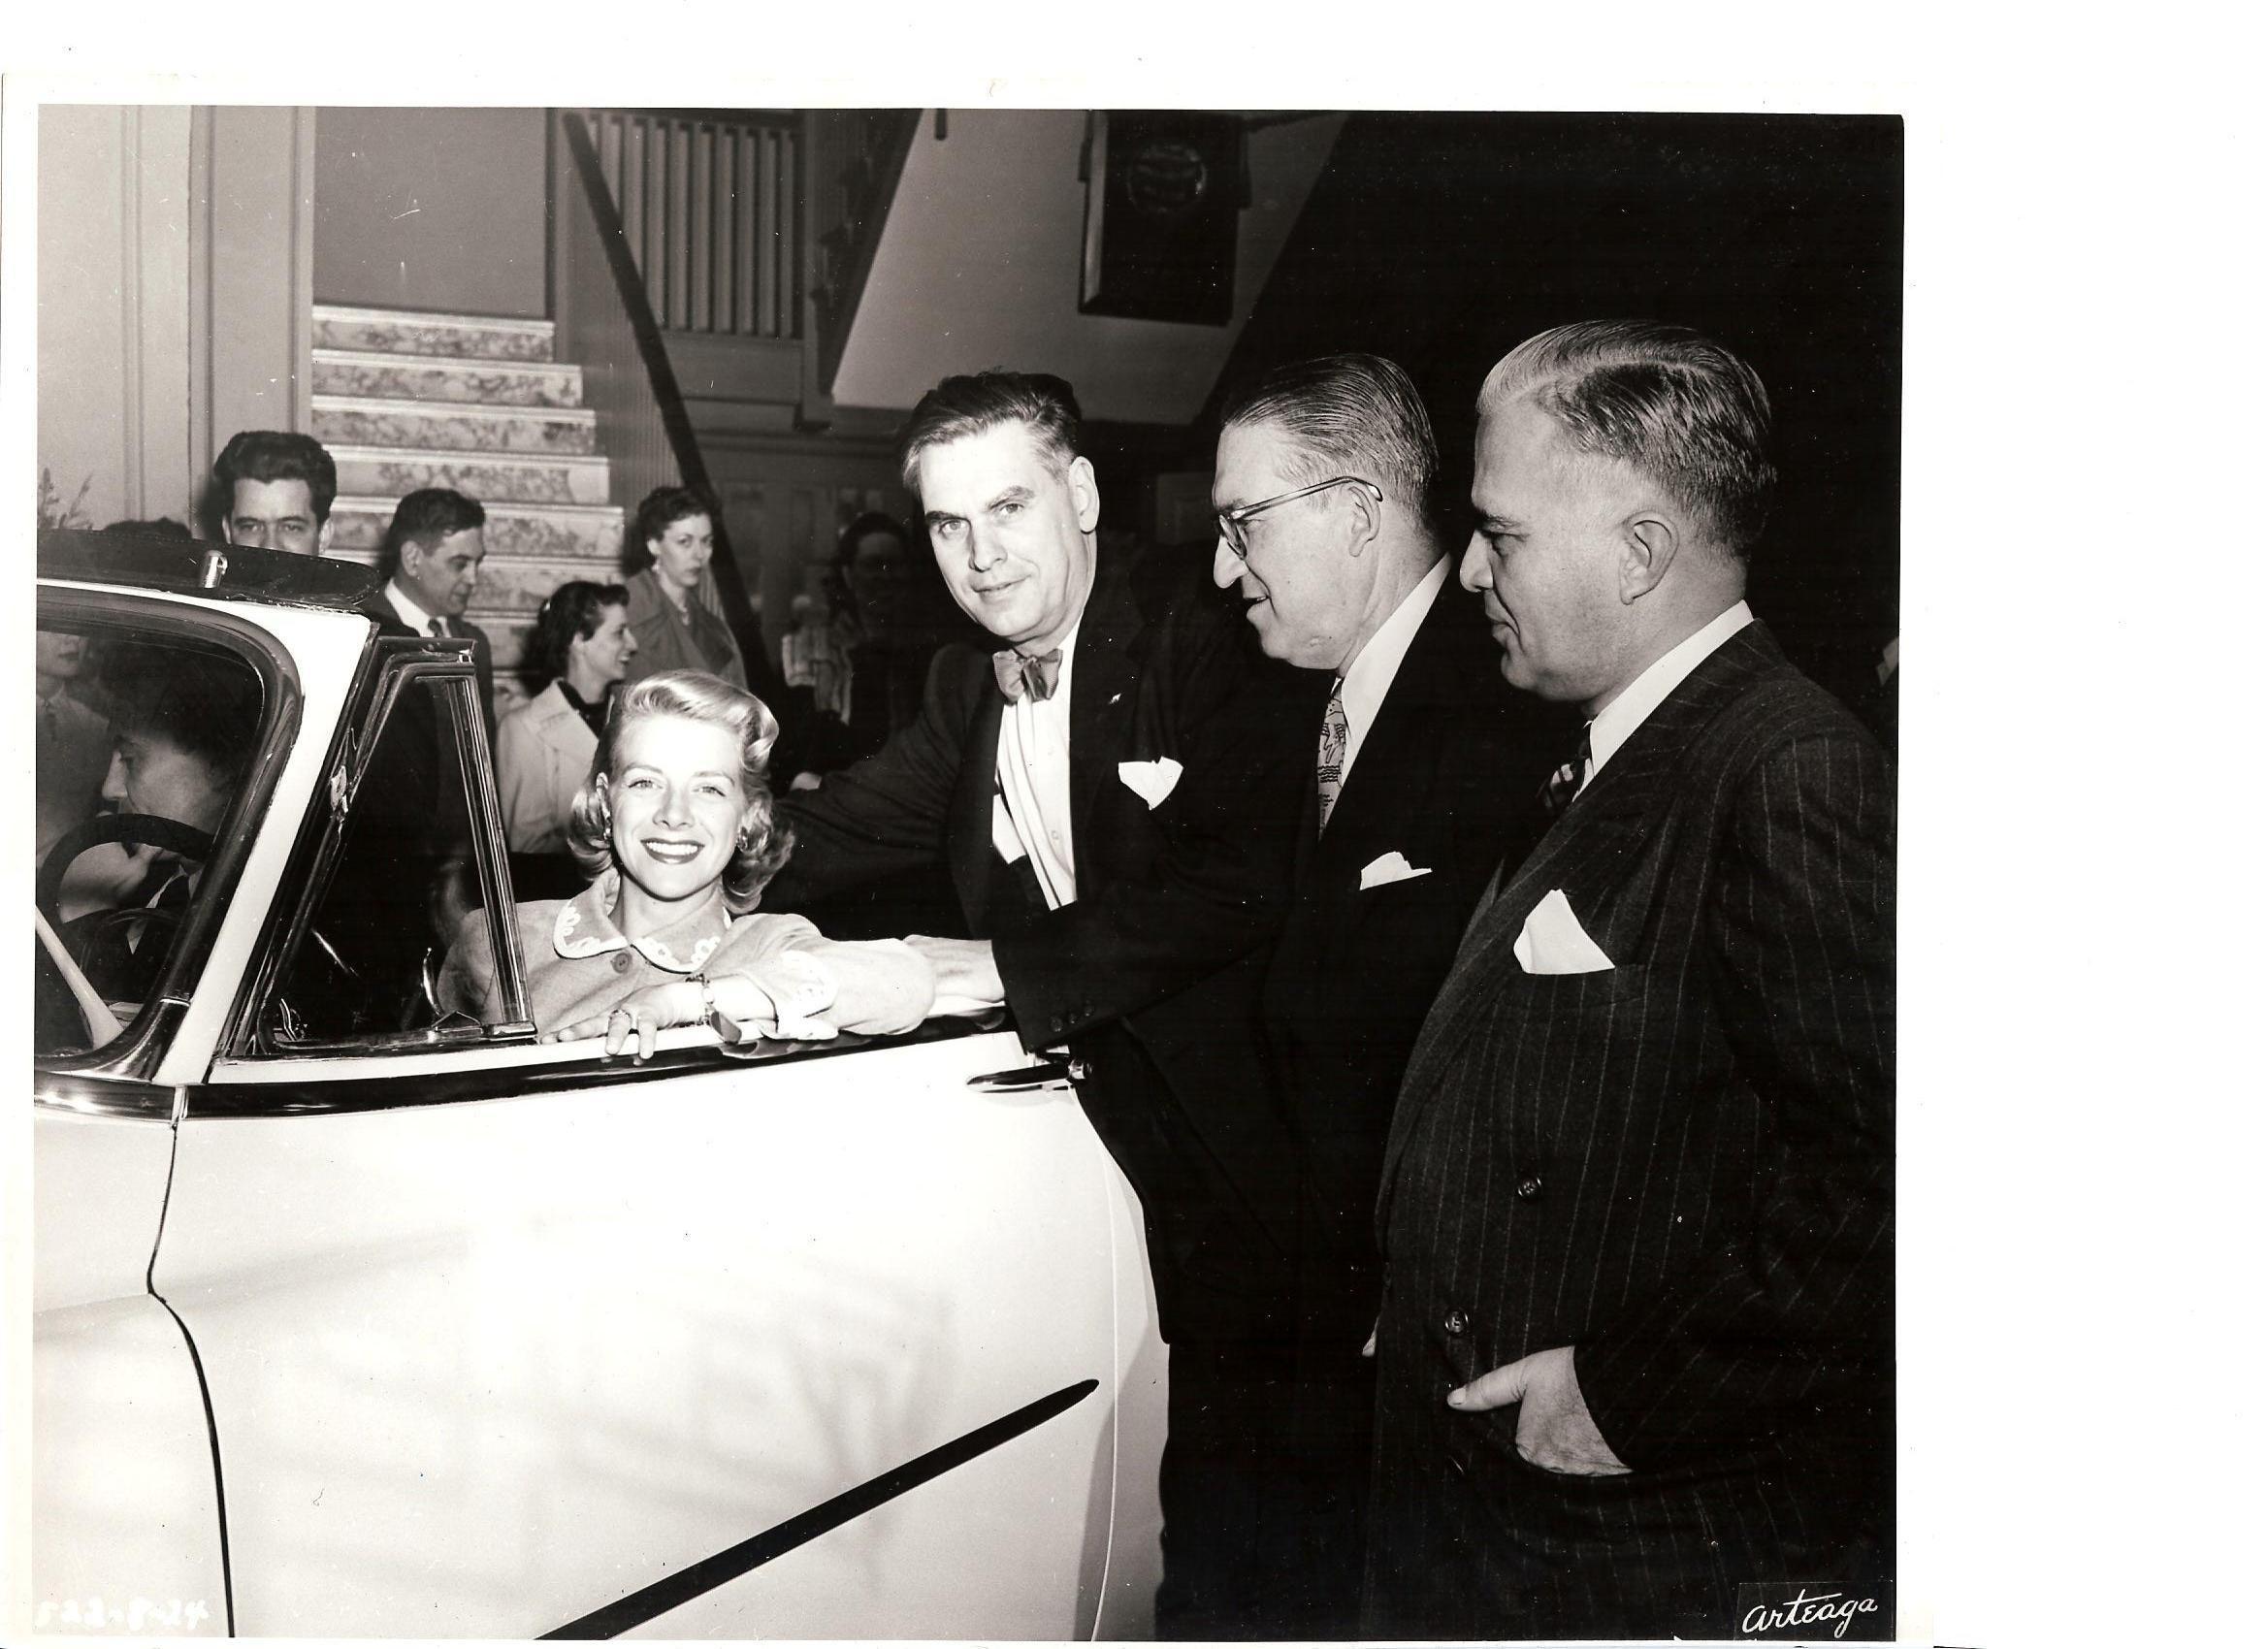 Weber Chevrolet Creve Coeur >> Rosemary Clooney, George Weber Jr. Jack Mazar, Ed Bruner | Our History | Rosemary clooney ...